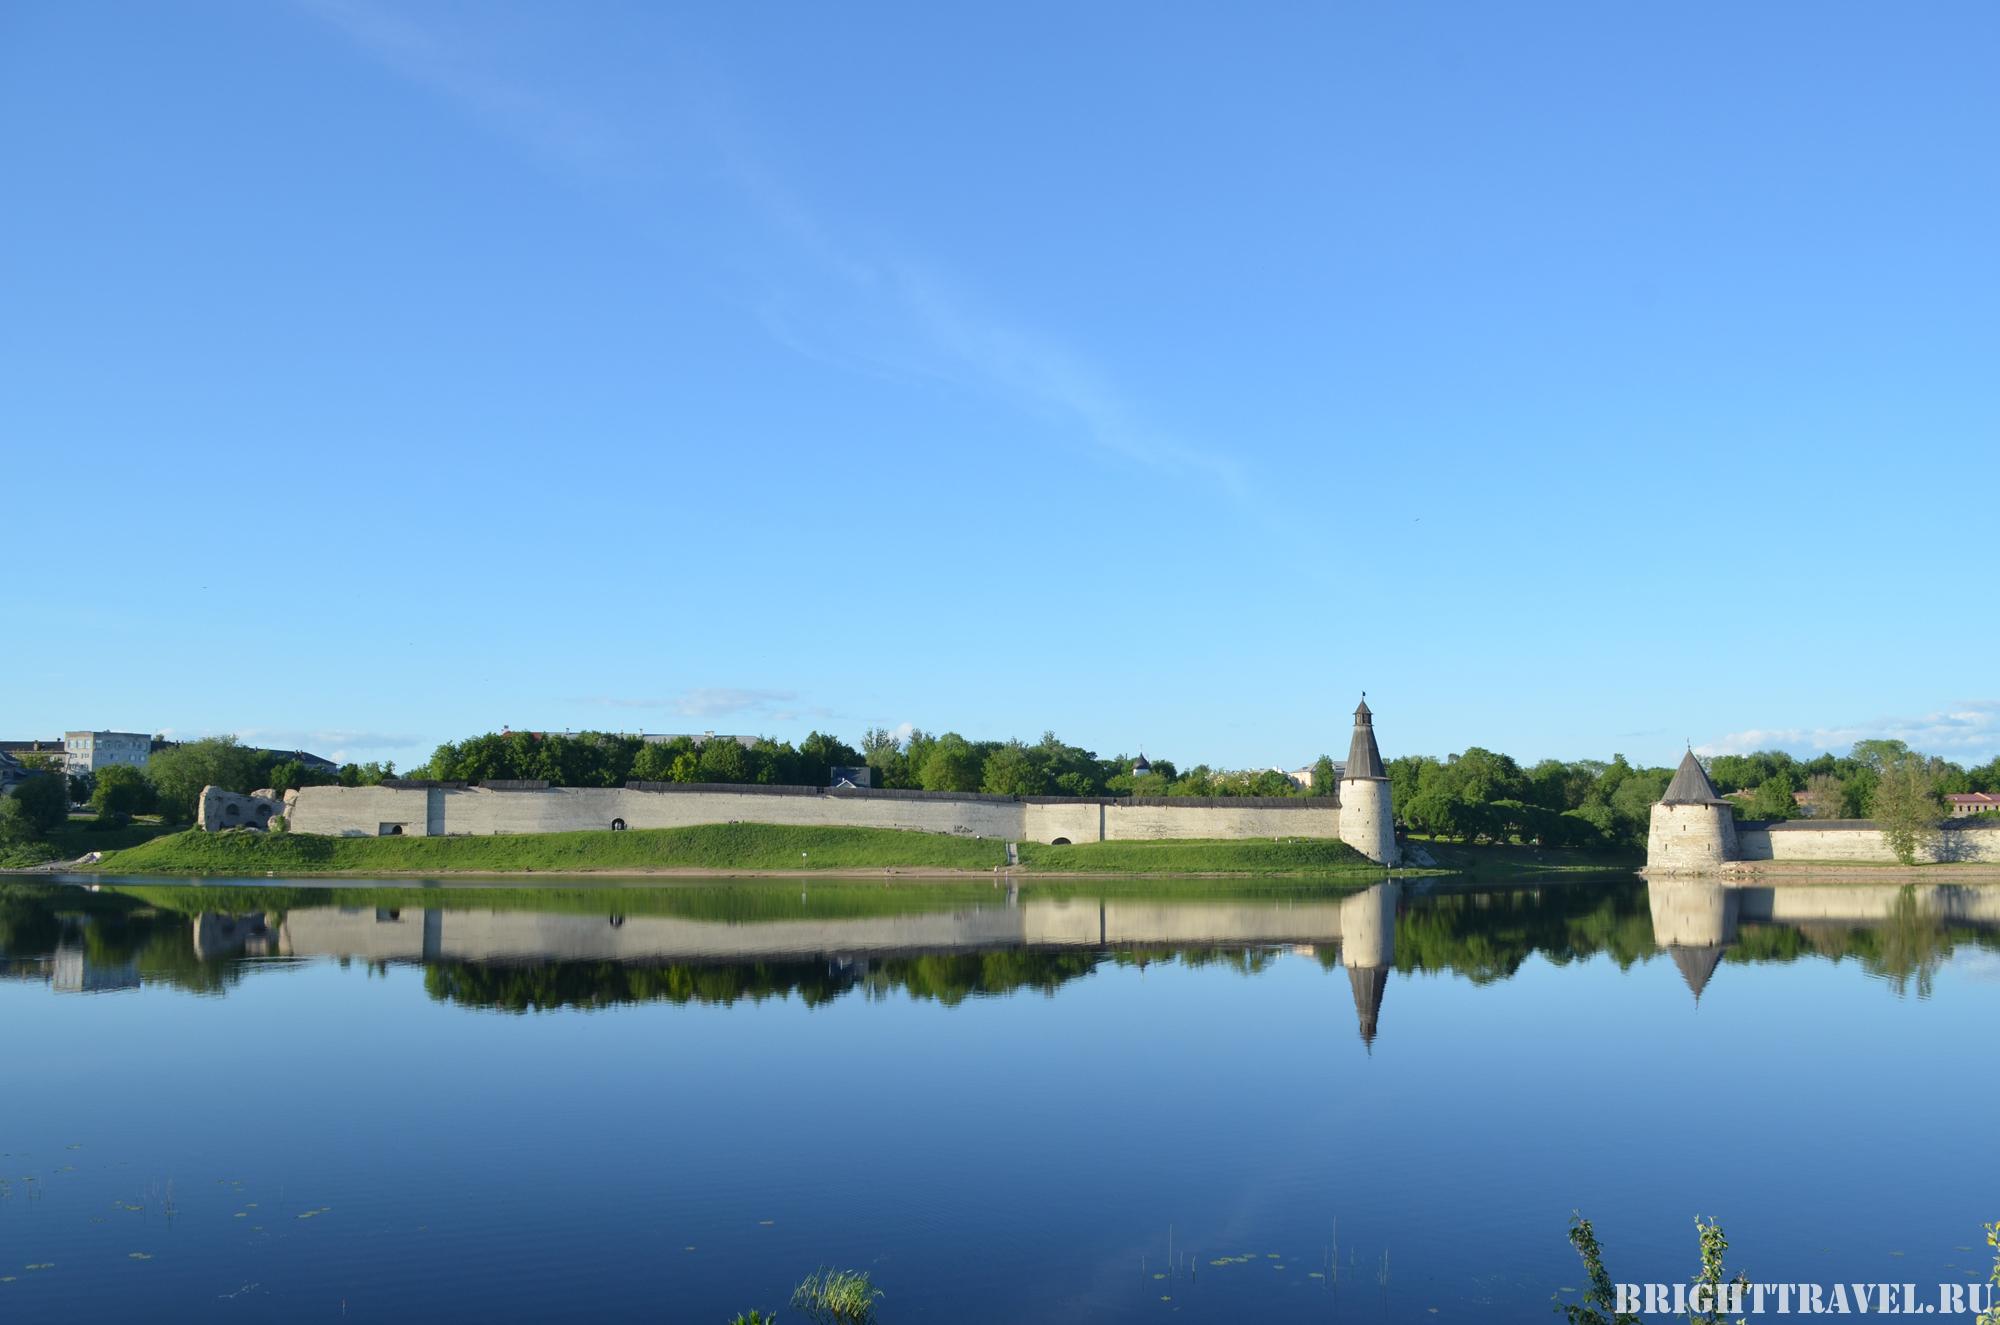 Красивое фото башен Пскова